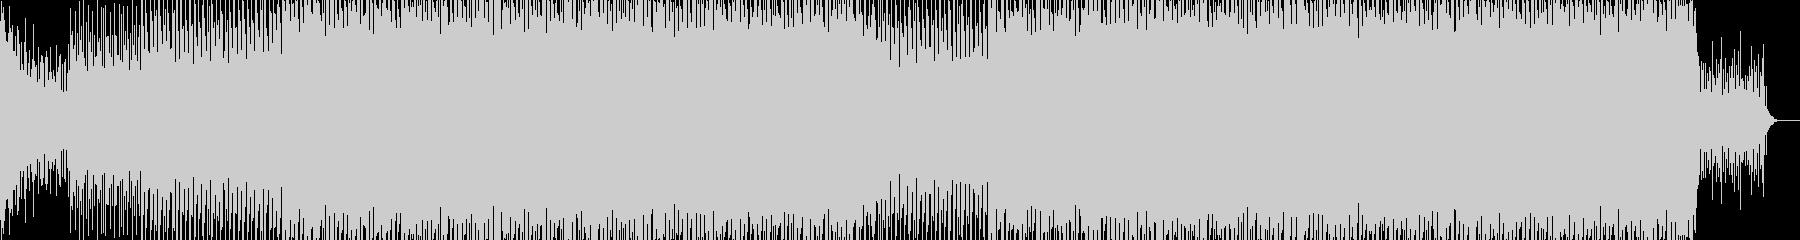 EDMポップで明るいクラブ系-68の未再生の波形